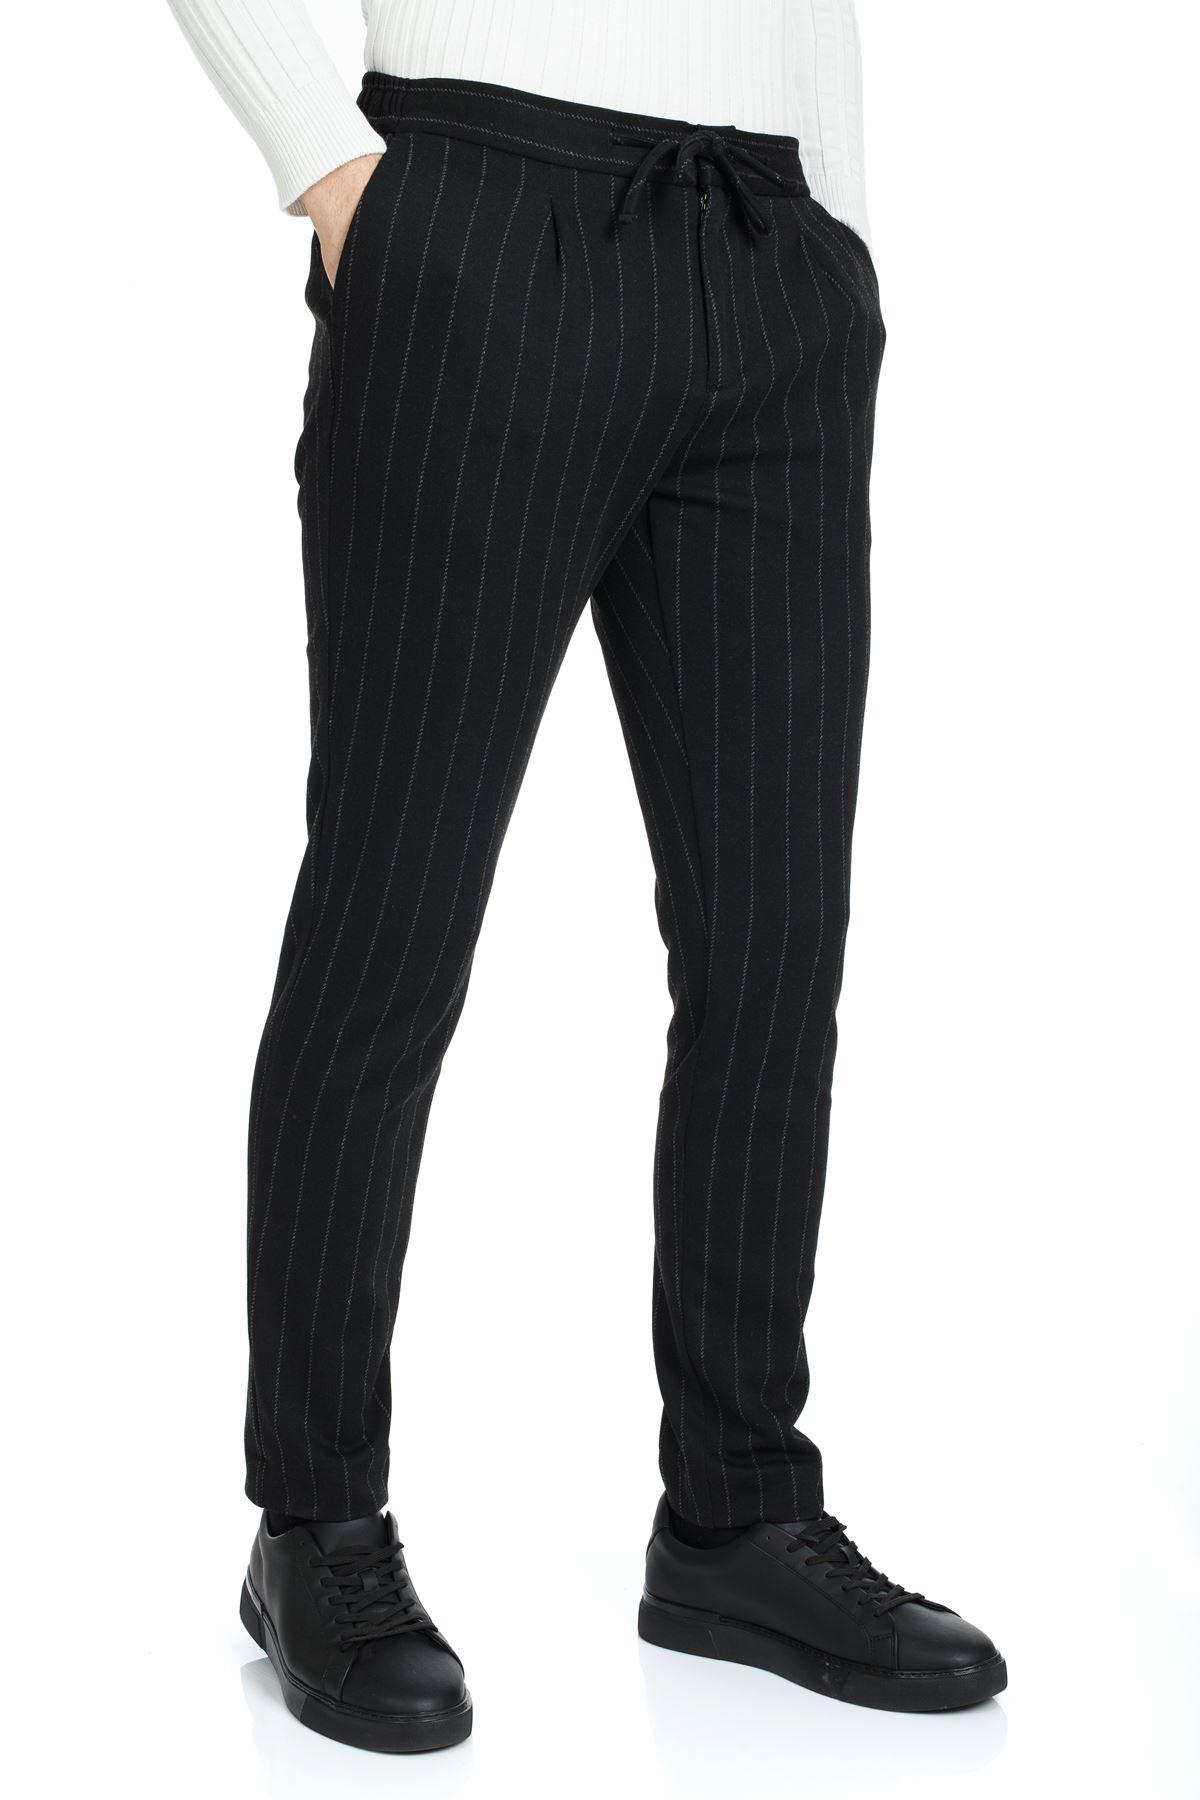 Siyah Beyaz Çizgili Jogger Spor Pantolon